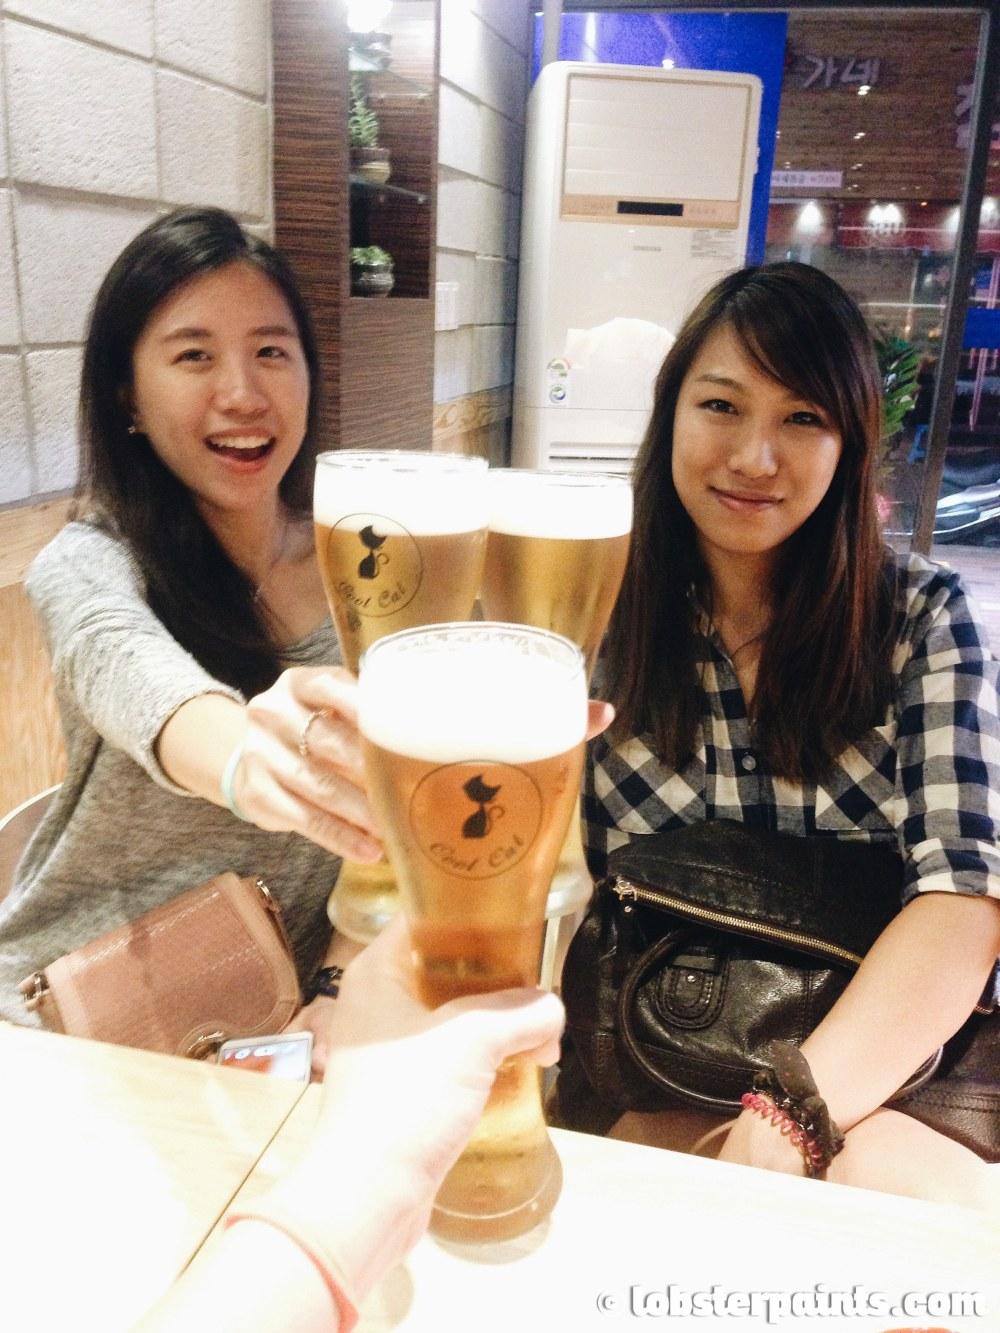 27 Sep 2014: Chicken & Beer at Cool Cat | Busan, South Korea